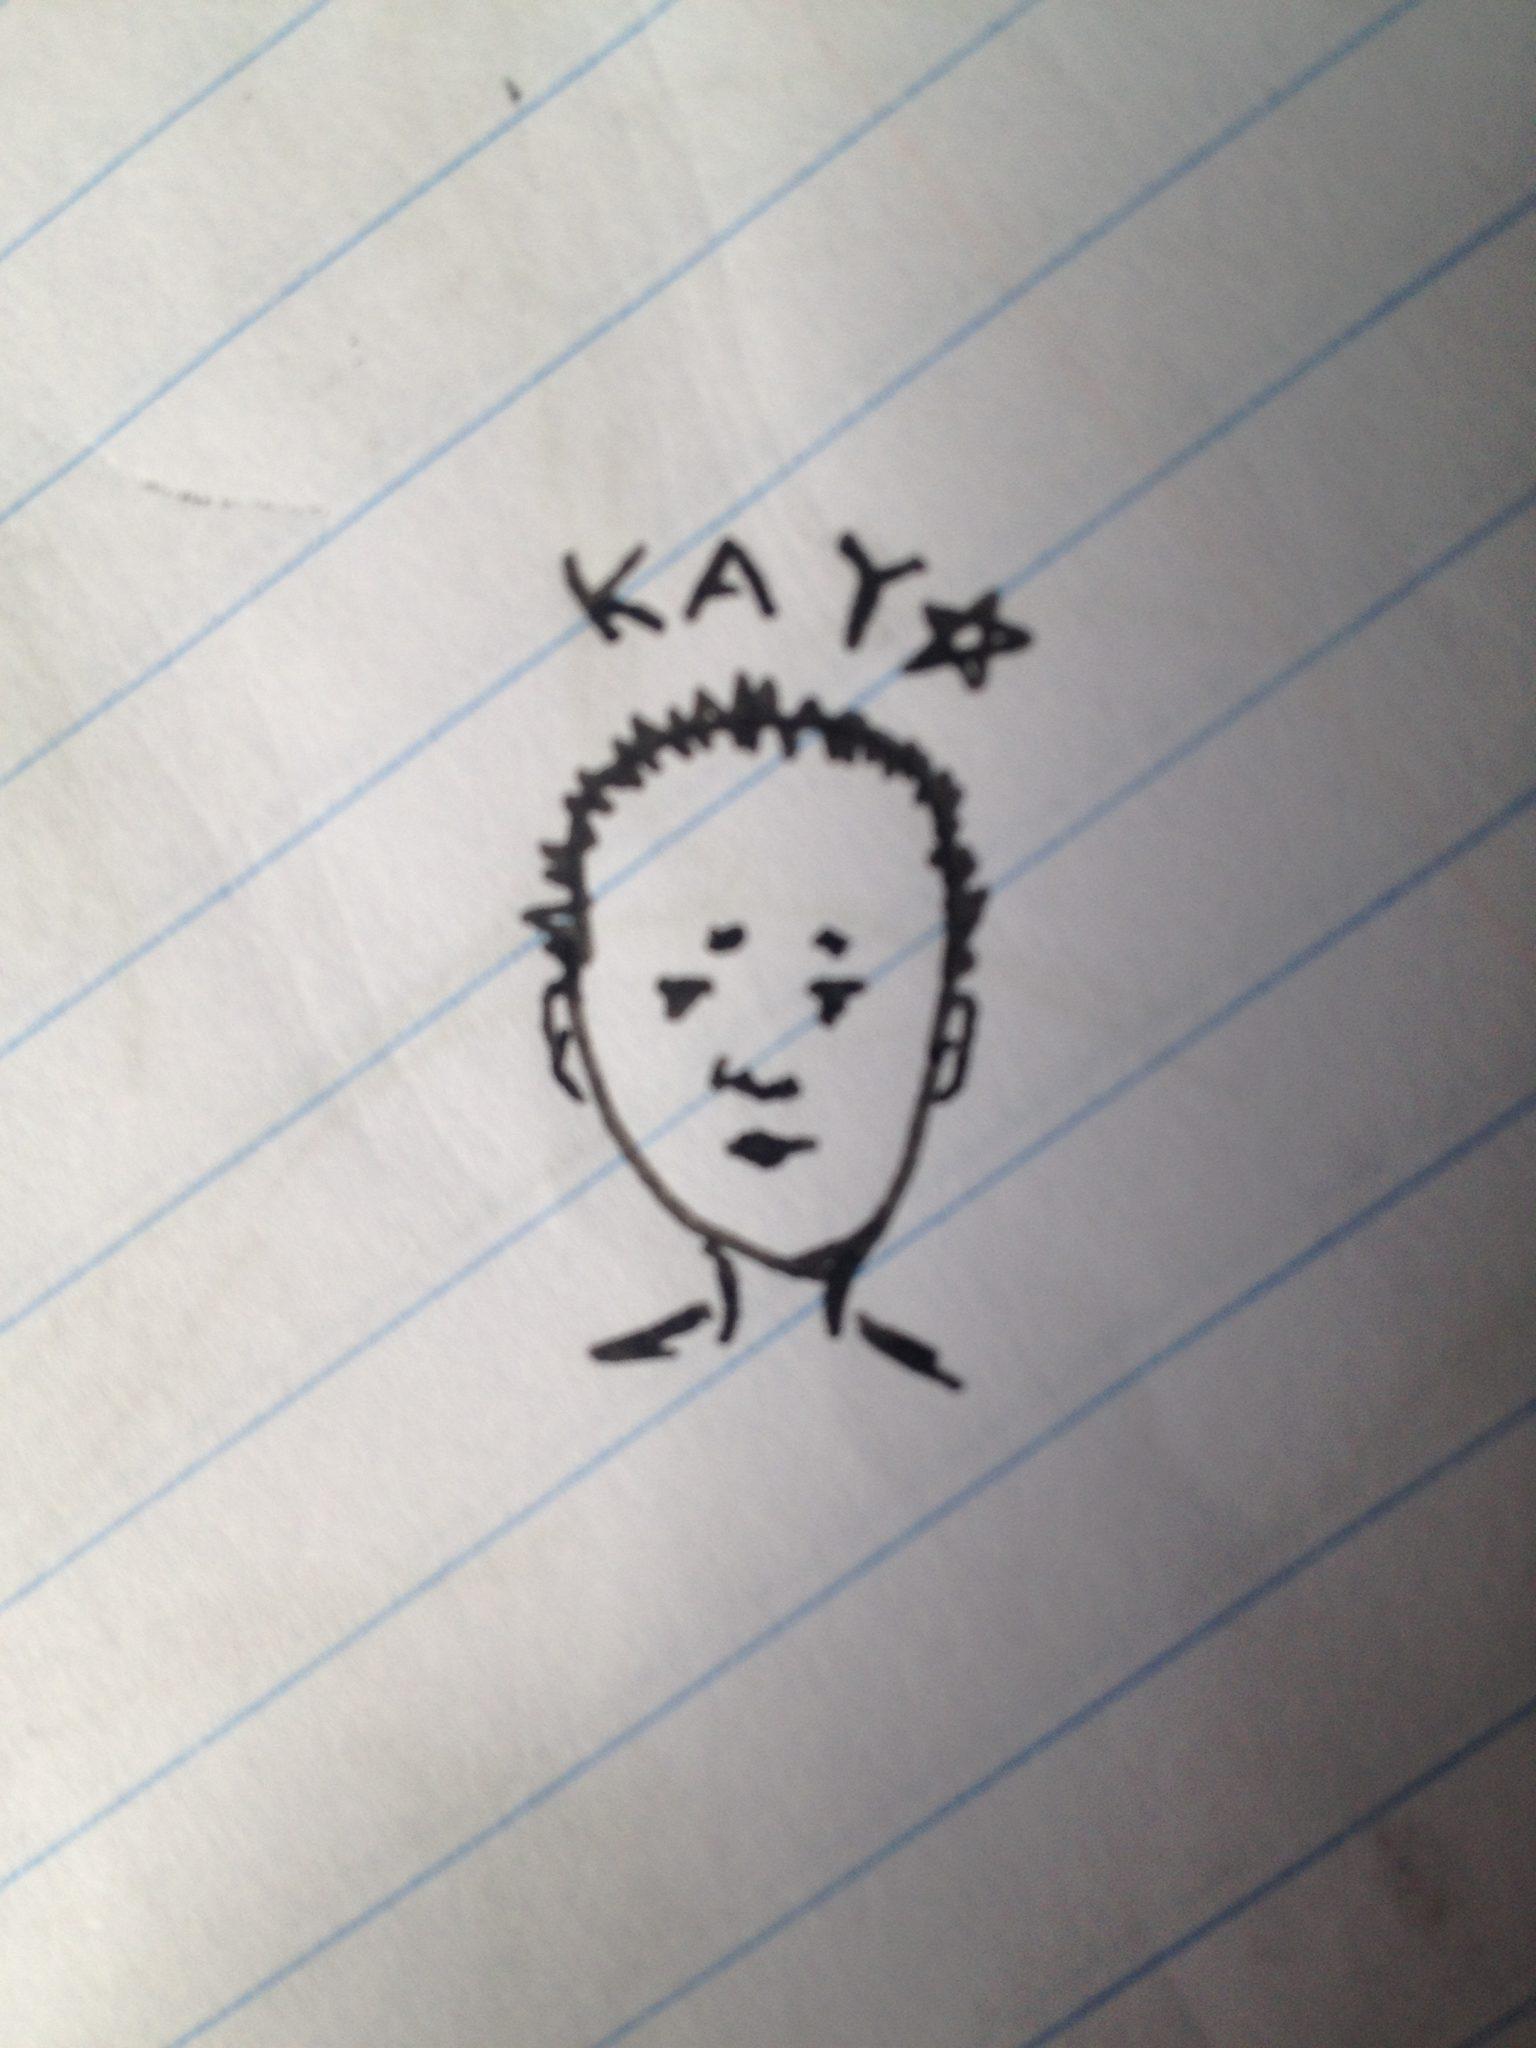 Kayo Hershins Original Art